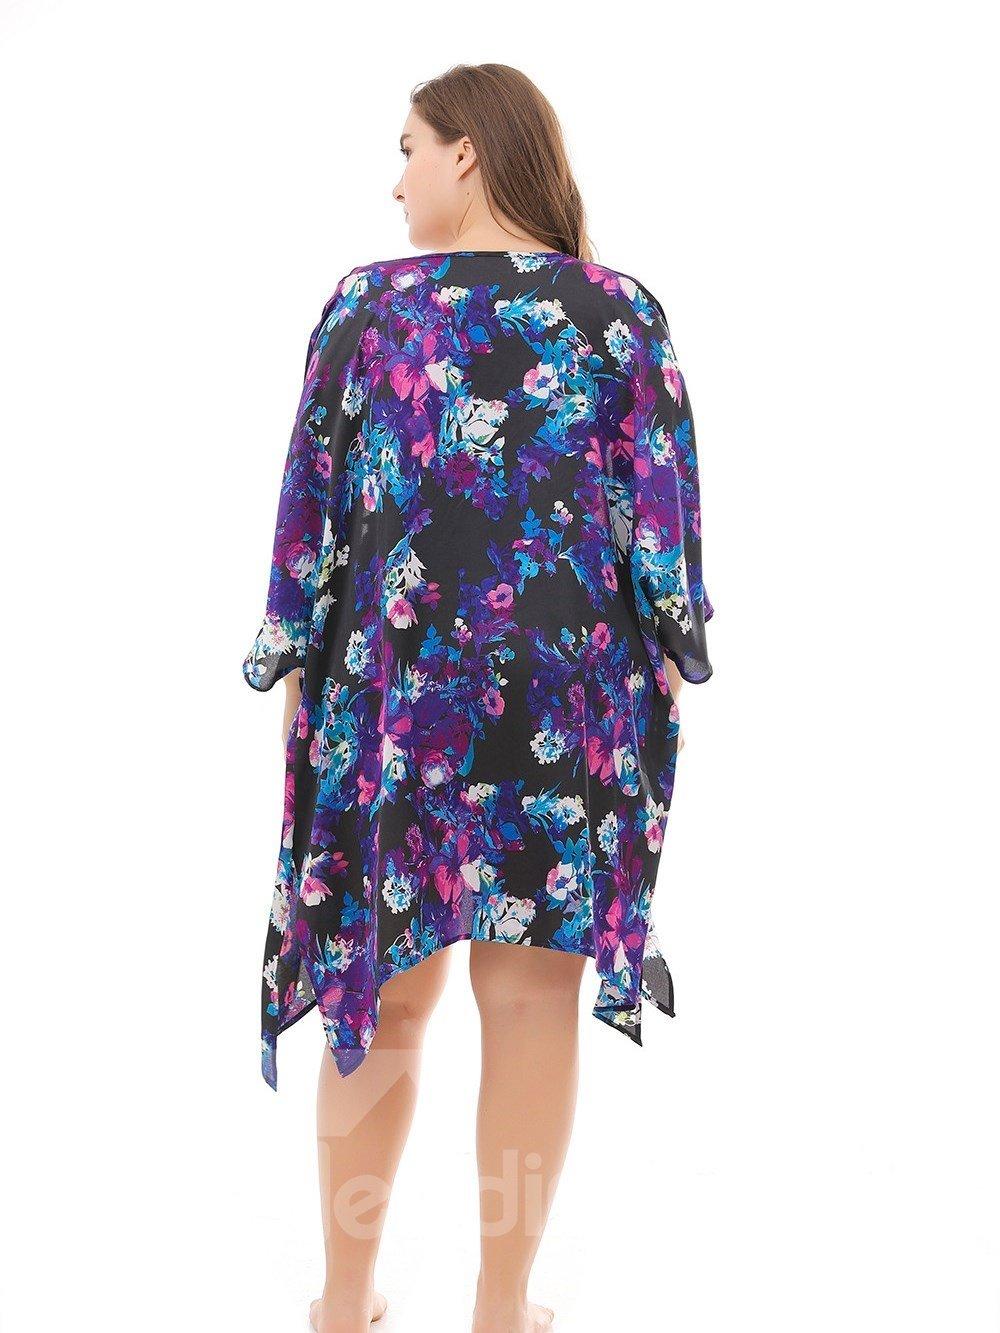 Beach Silhouette Polyester Three-Quarter-Sleeve Plus Size Dress